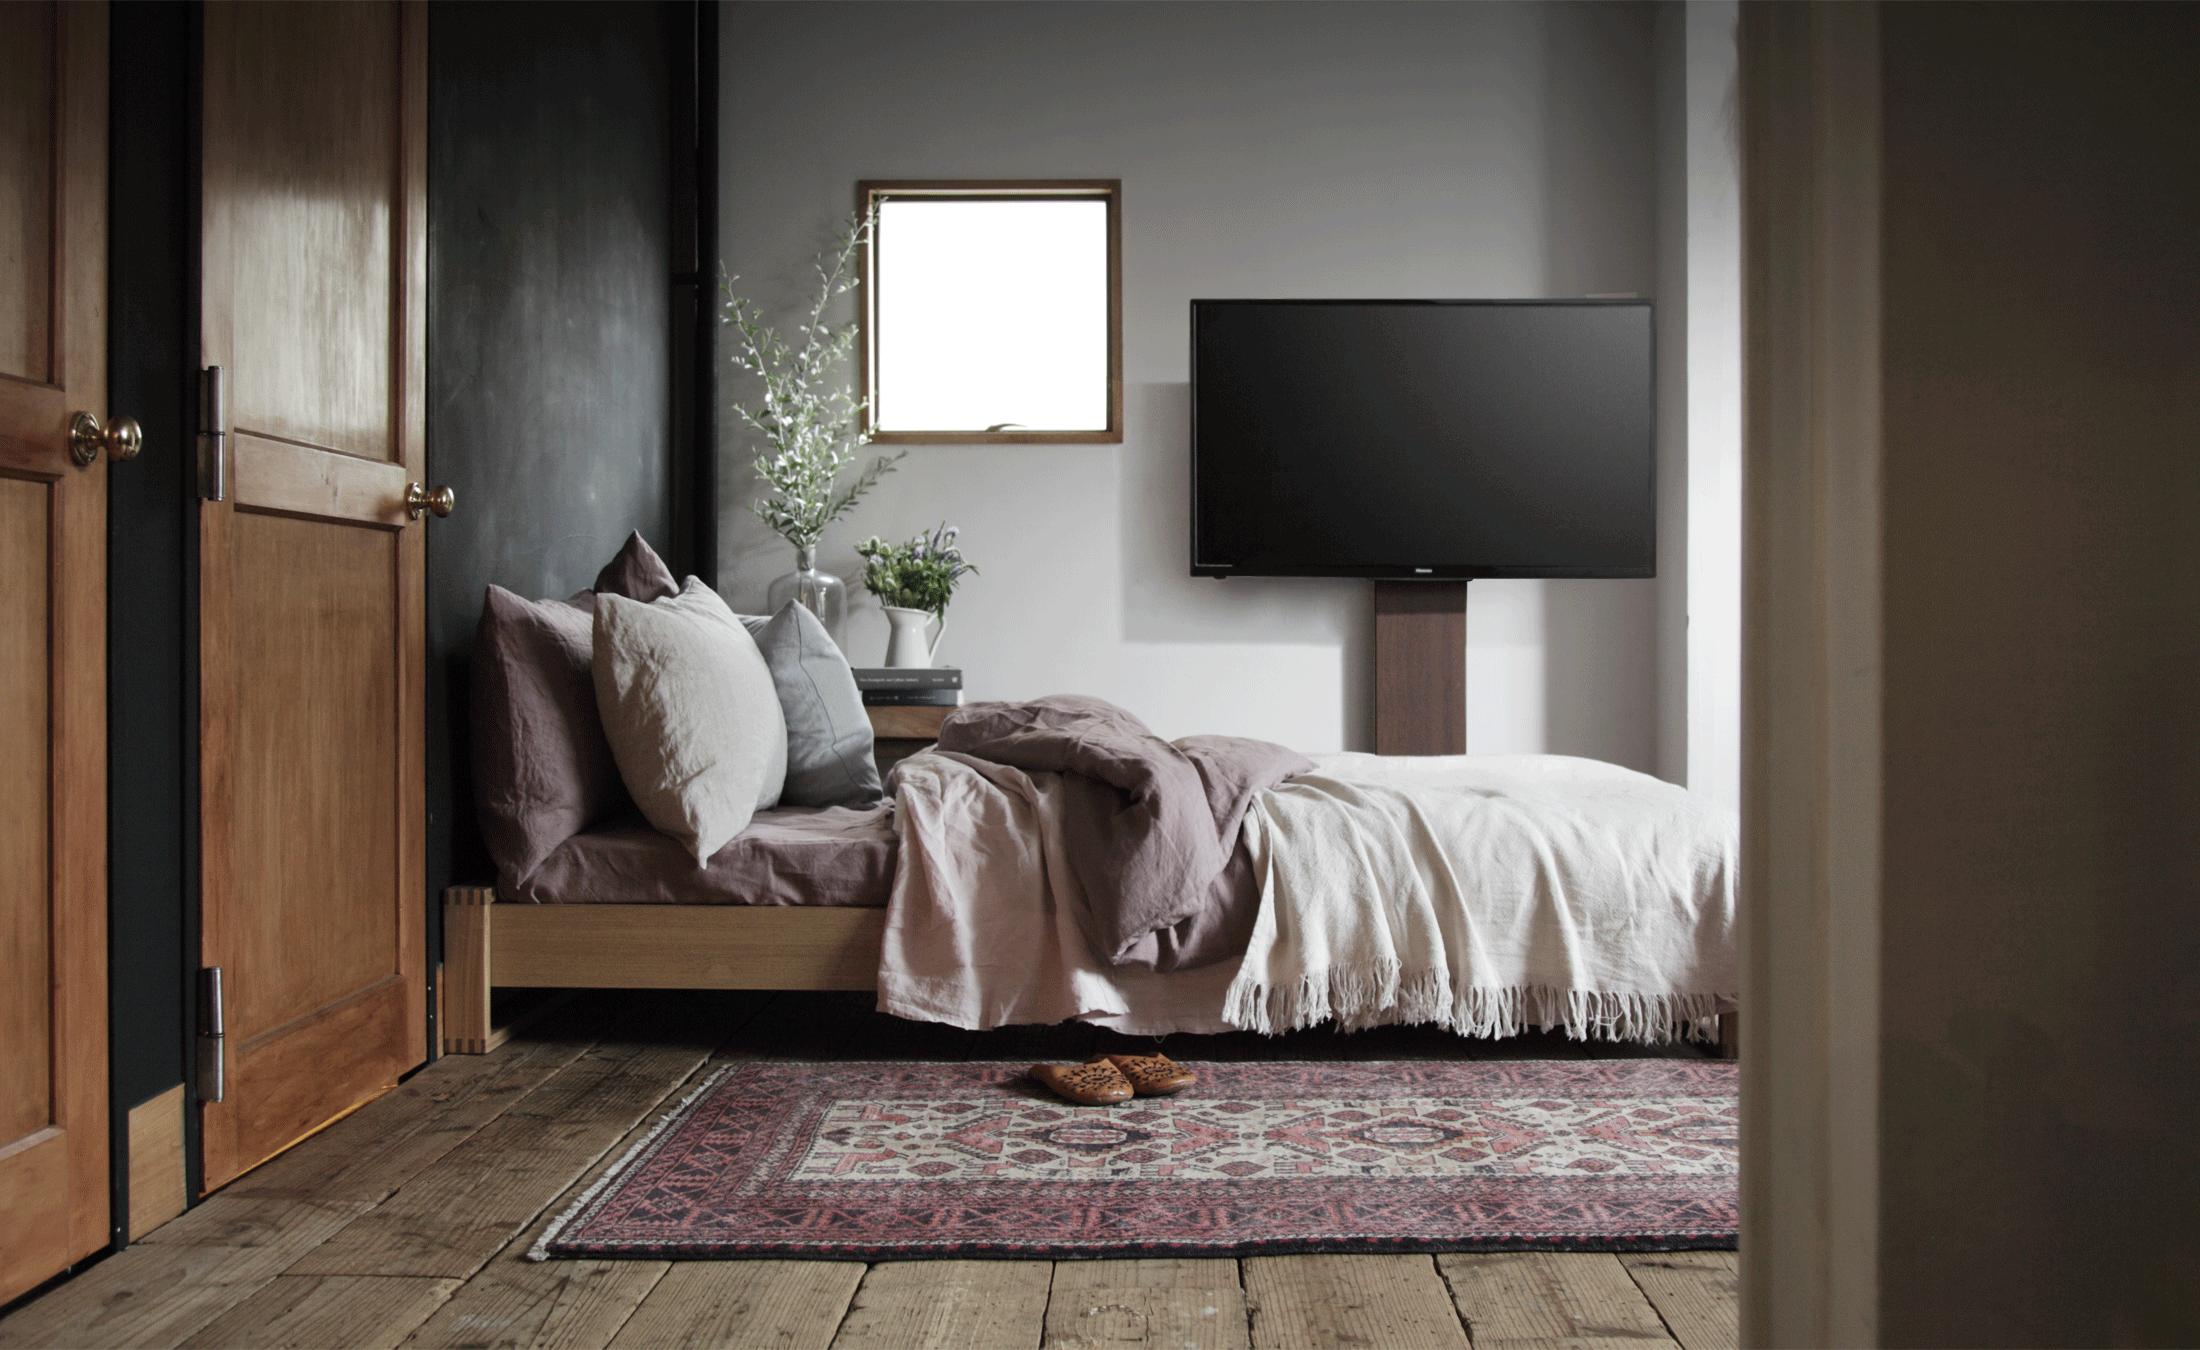 WALL INTERIOR TV STAND V3 壁寄せテレビスタンドV3 BEDROOM 1枚目